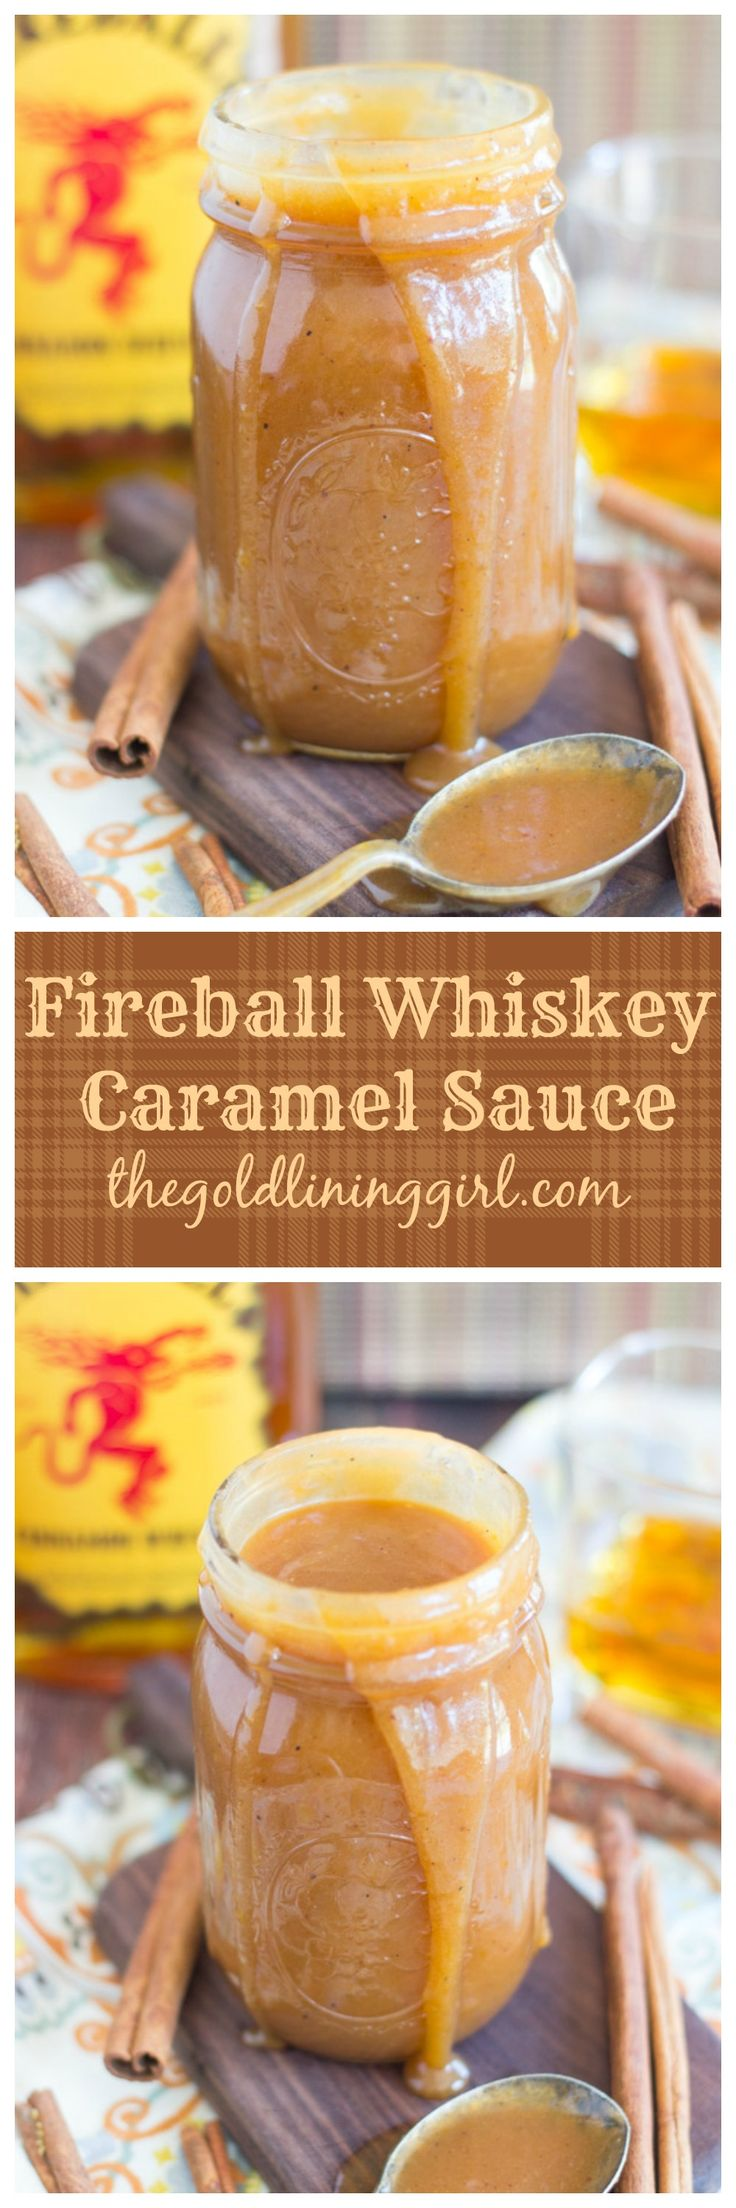 Fireball Whiskey Caramel Sauce Recipe pin